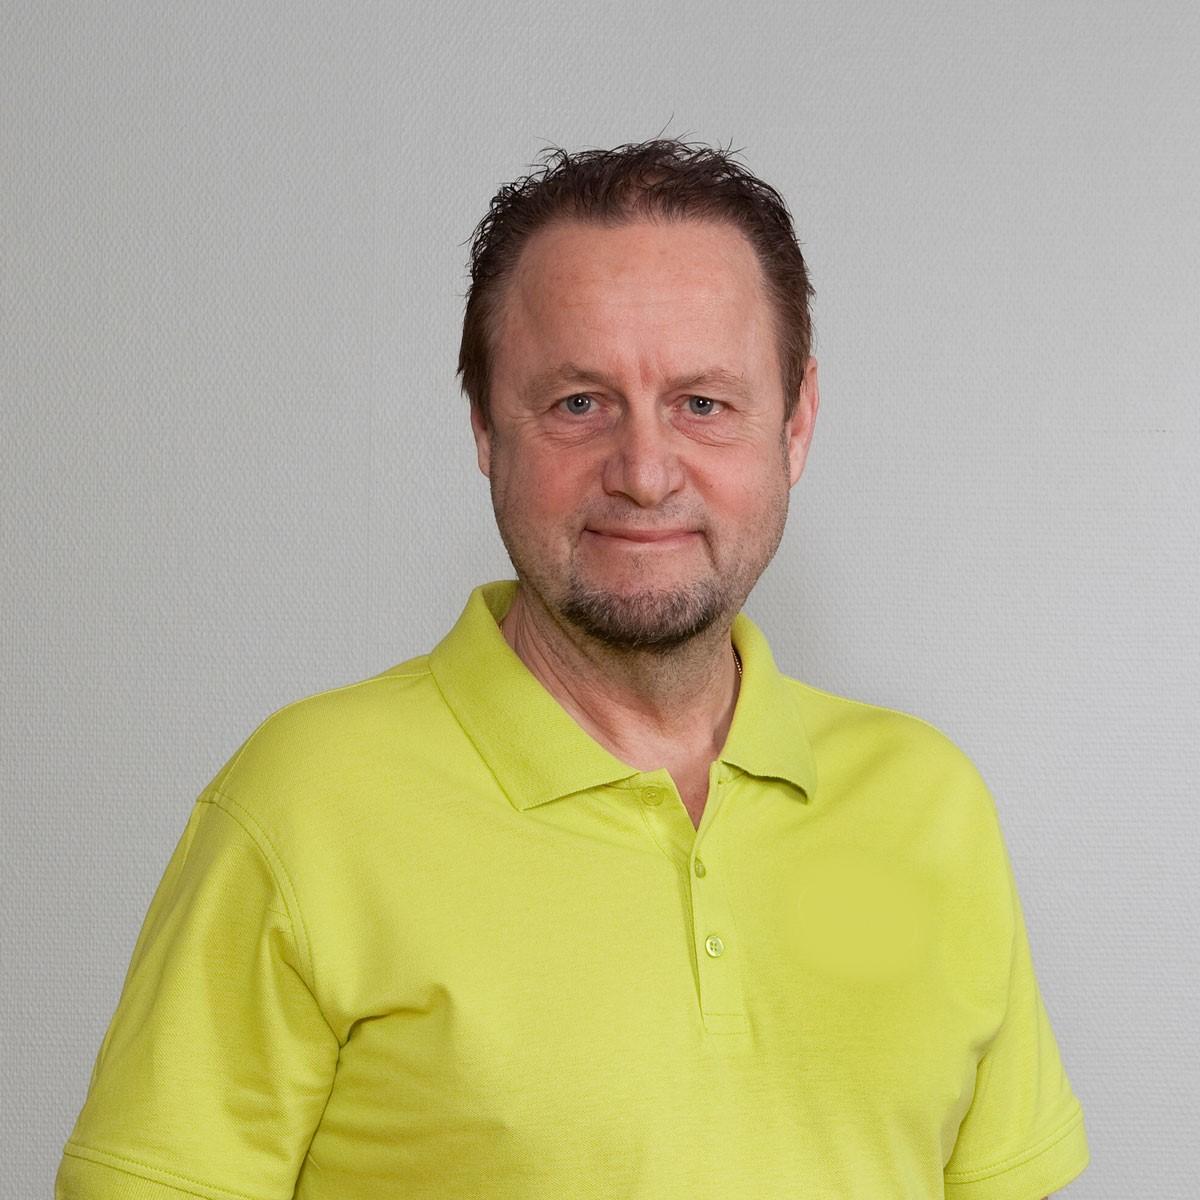 Björn Lystell